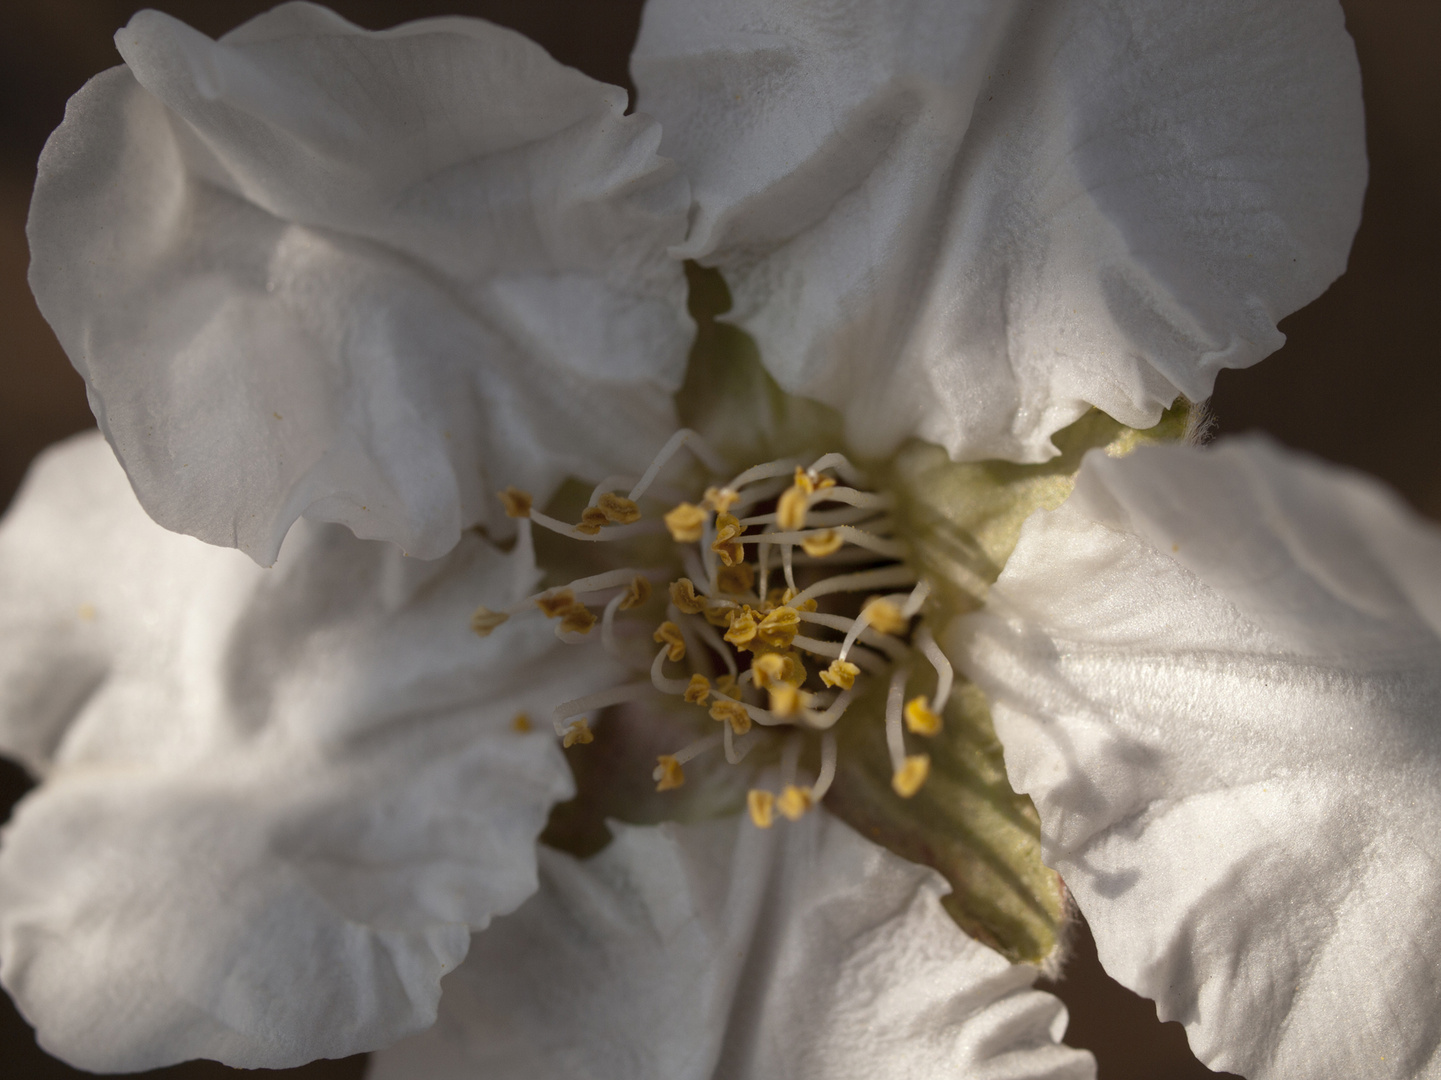 la flor de almendro